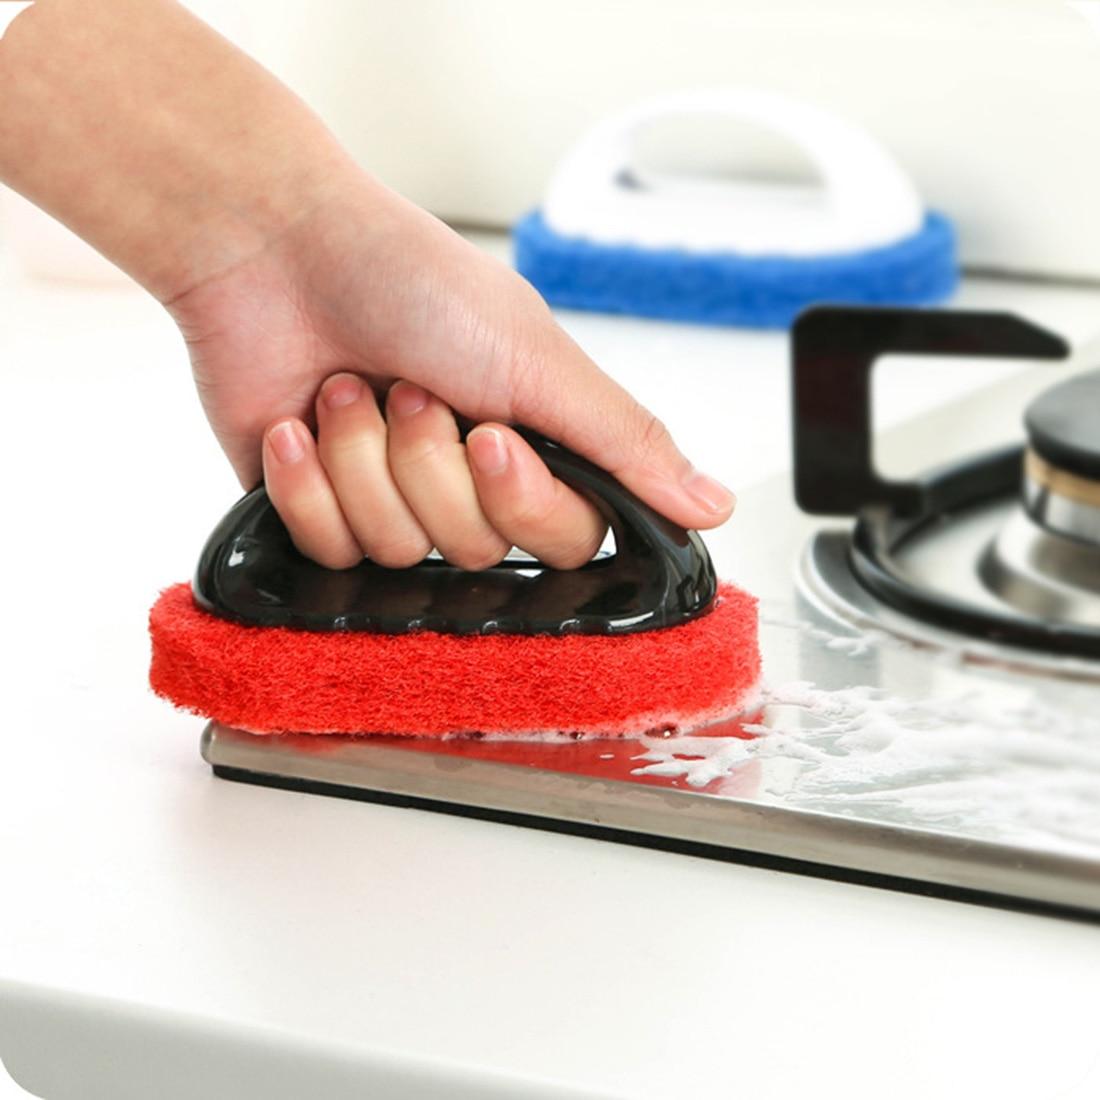 Hot sale Household Supplies Handle Hard Sponge Cleaning Brush Sanitary Tools Brusher